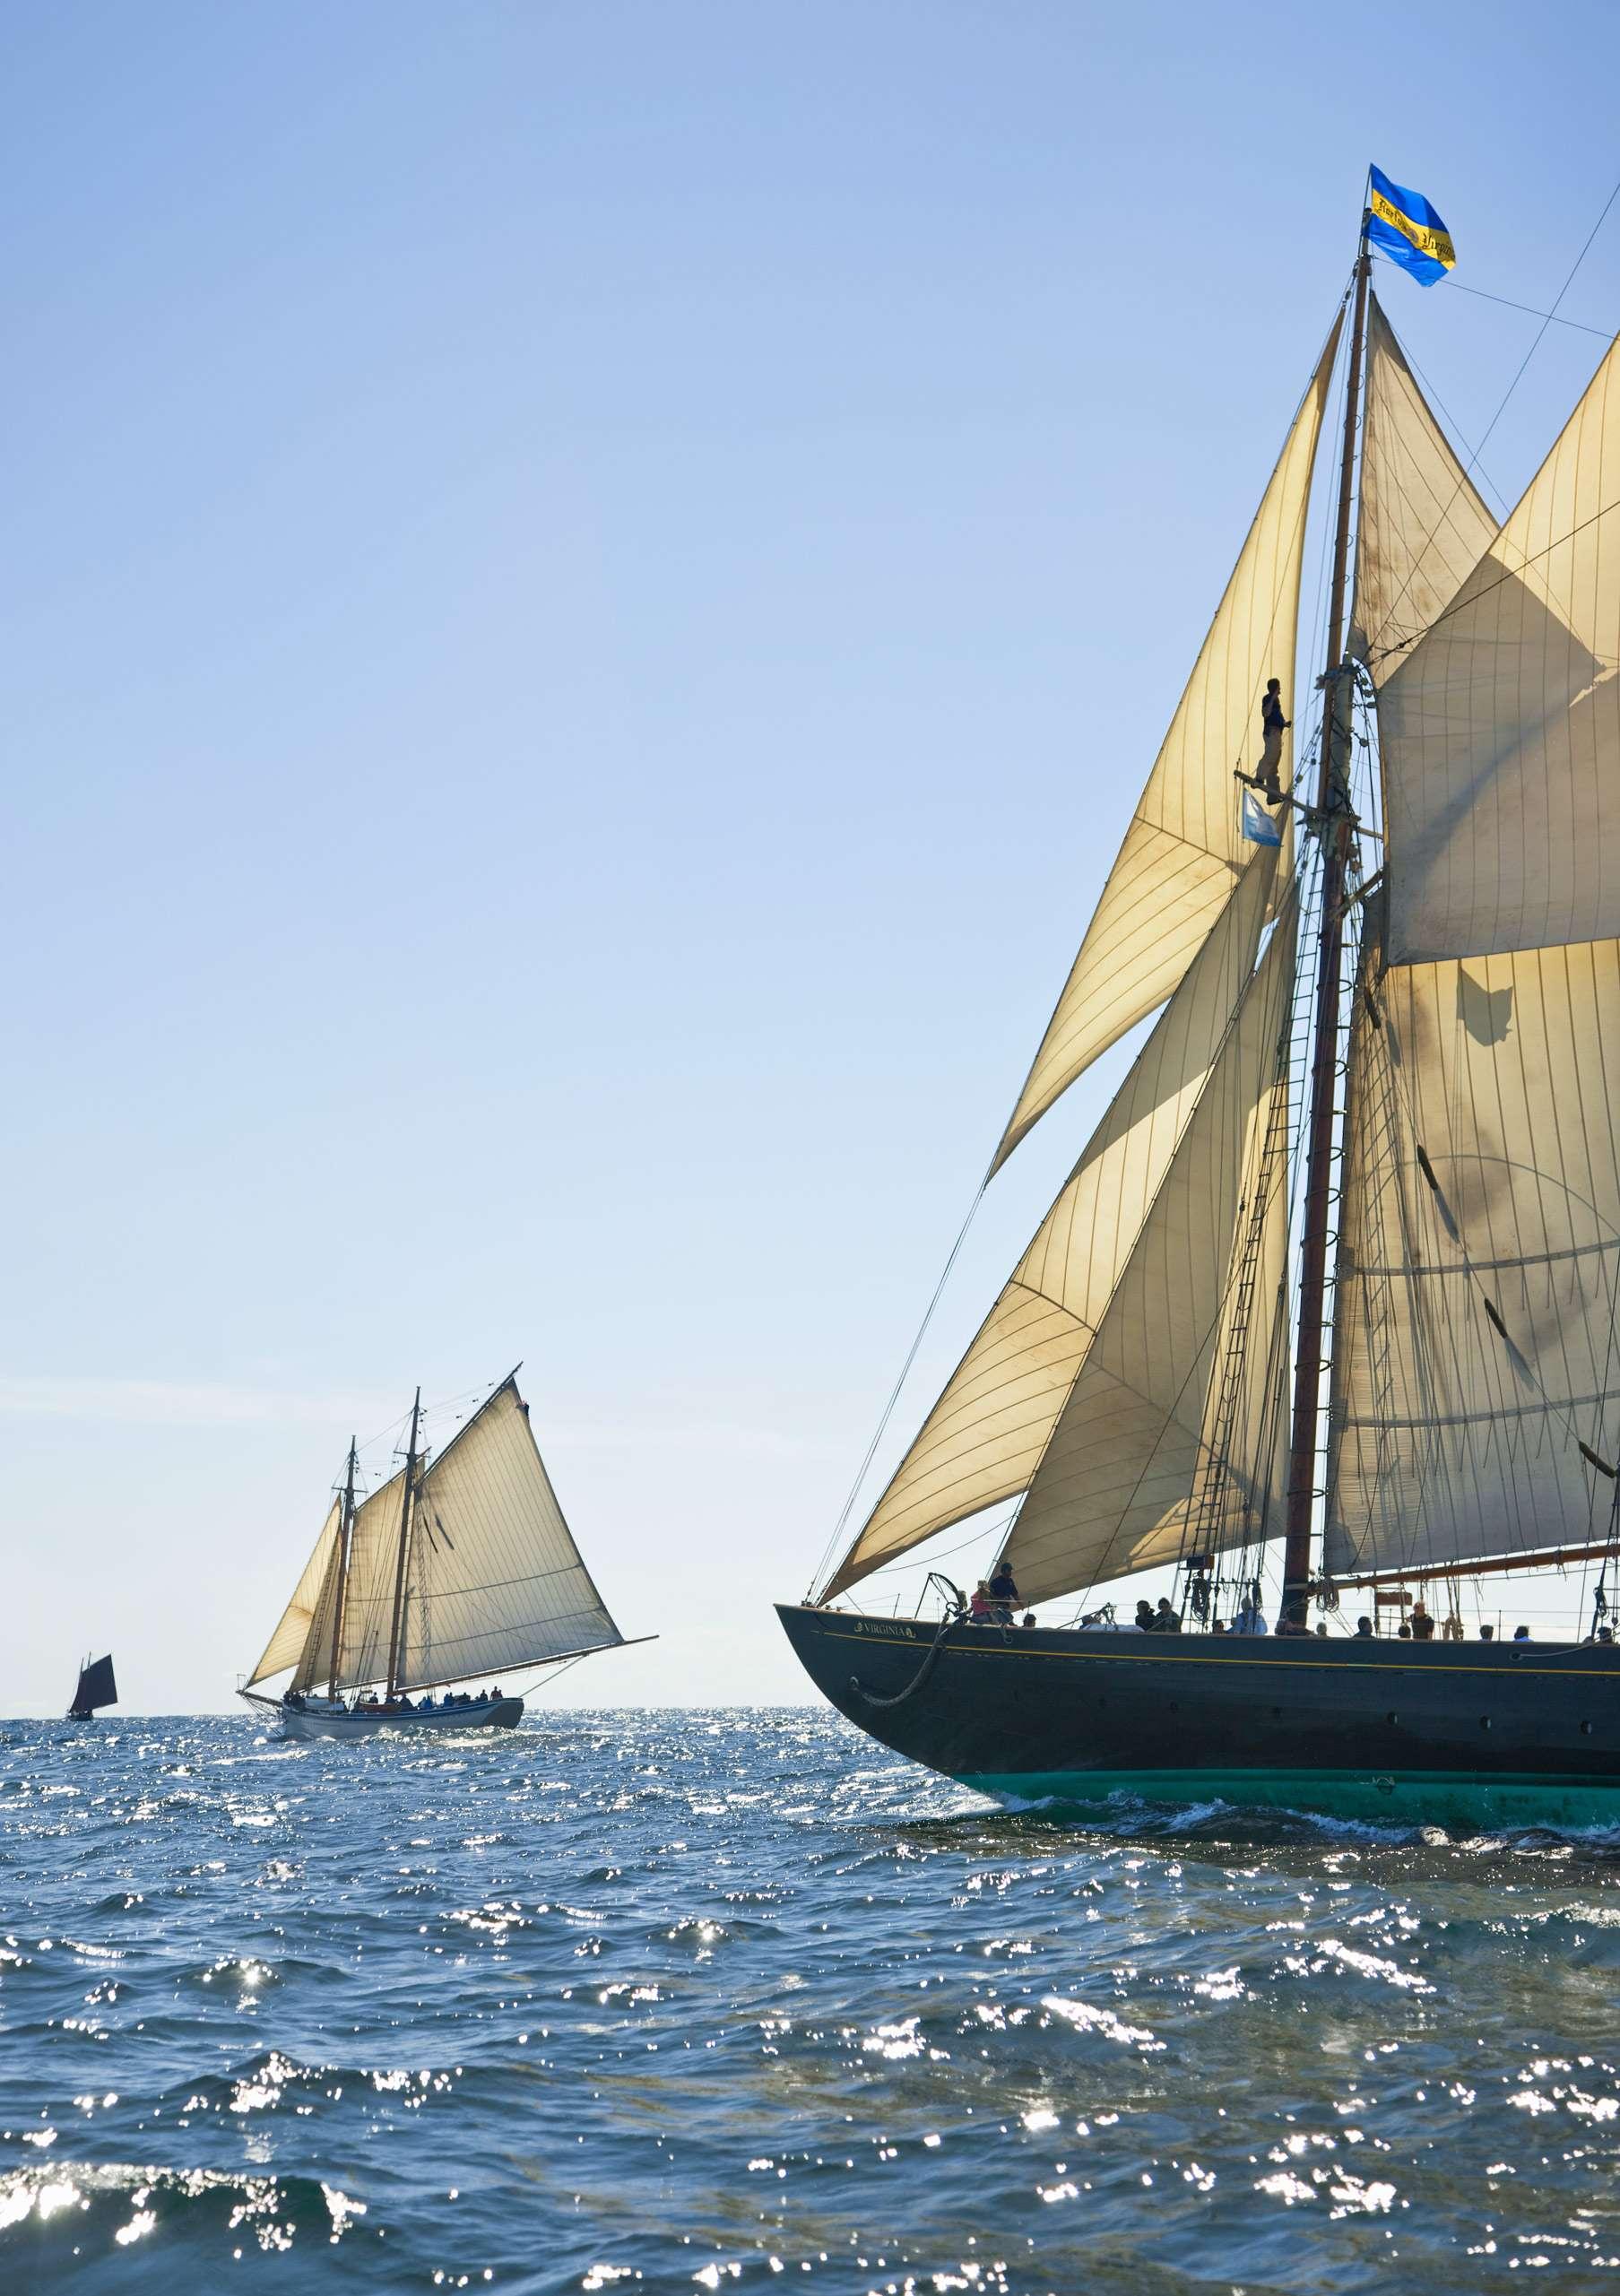 PORTFOLIO - Sailing - Windjammers #20   PCG462